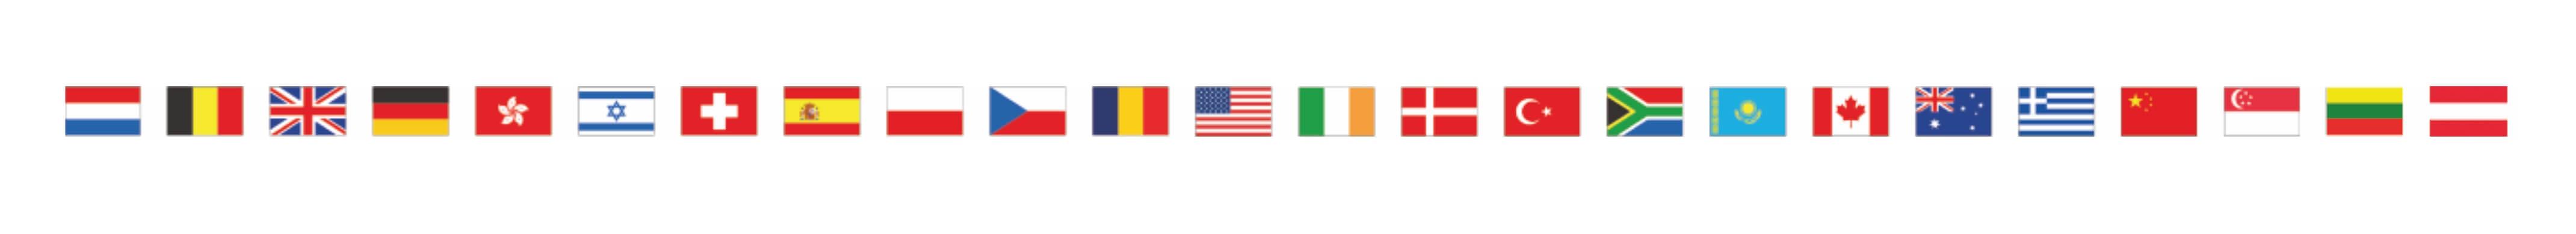 24 Flags jpg